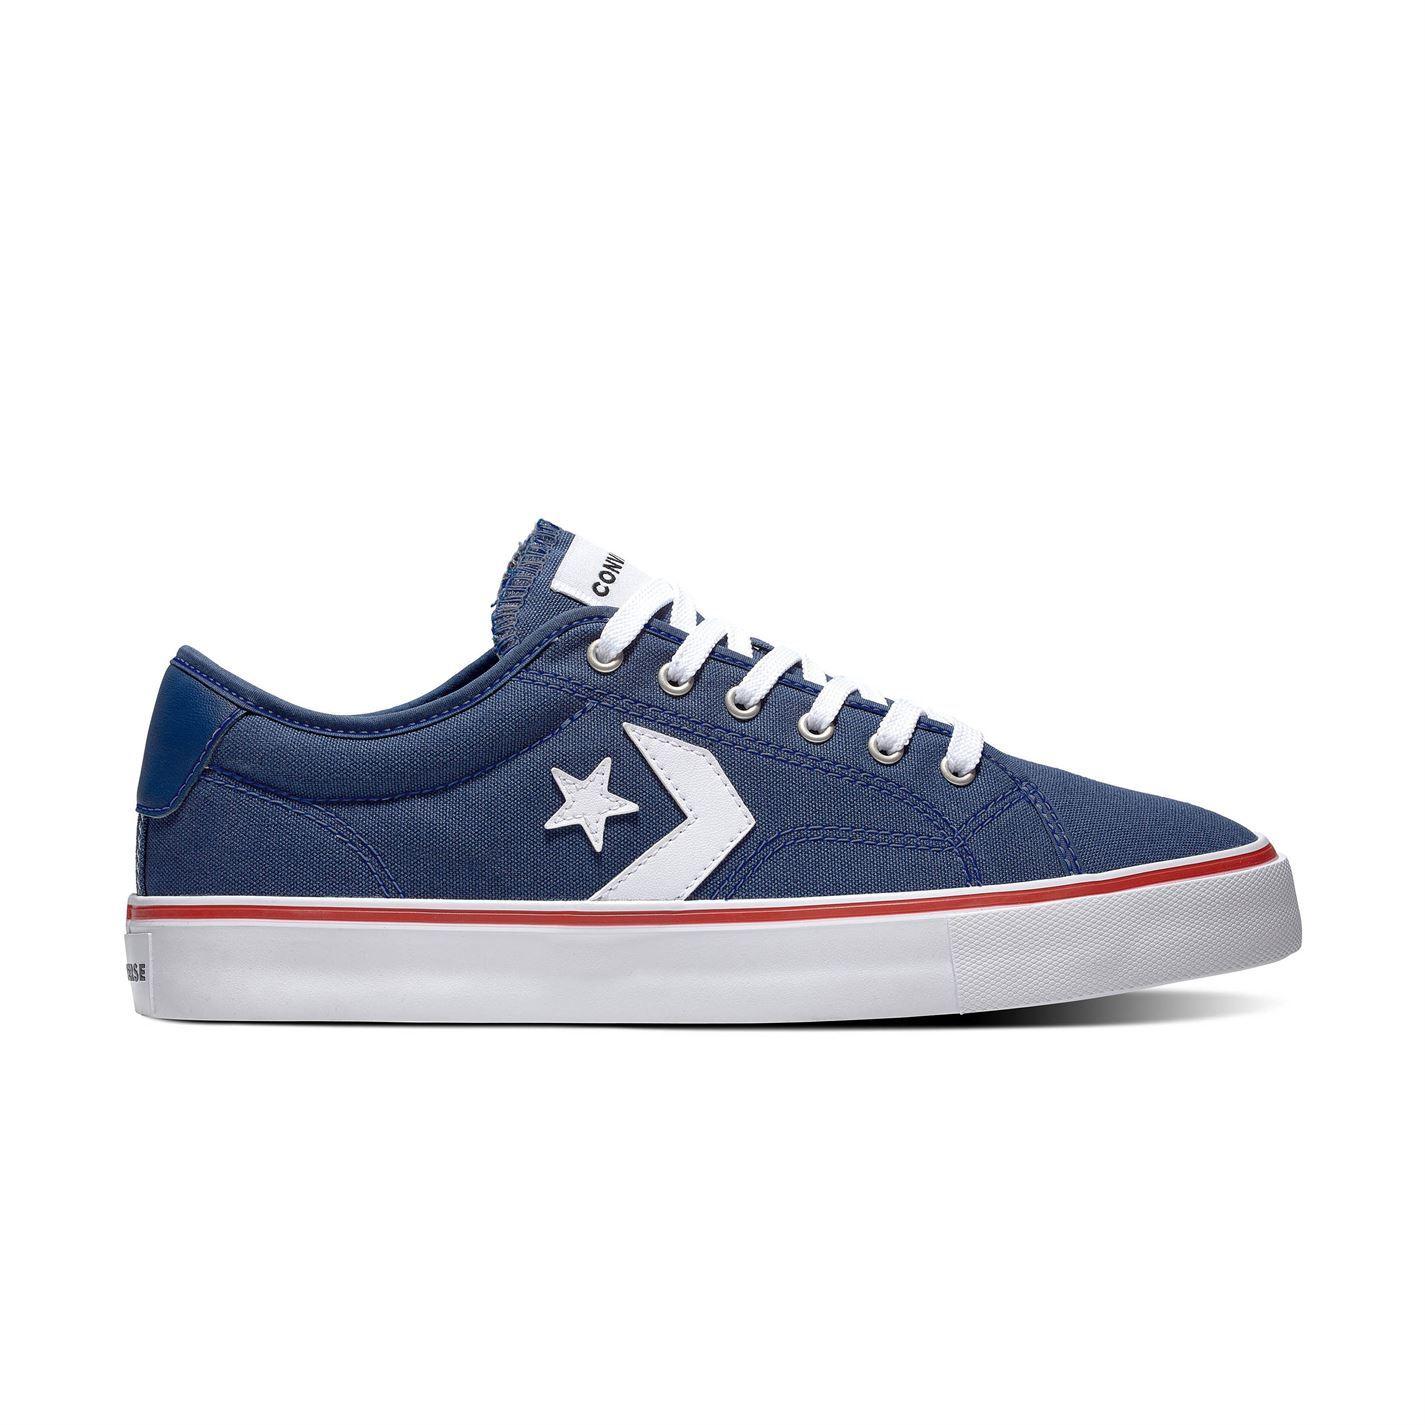 Converse-Ox-REPLAY-Baskets-Pour-Homme-Chaussures-De-Loisirs-Chaussures-Baskets miniature 17